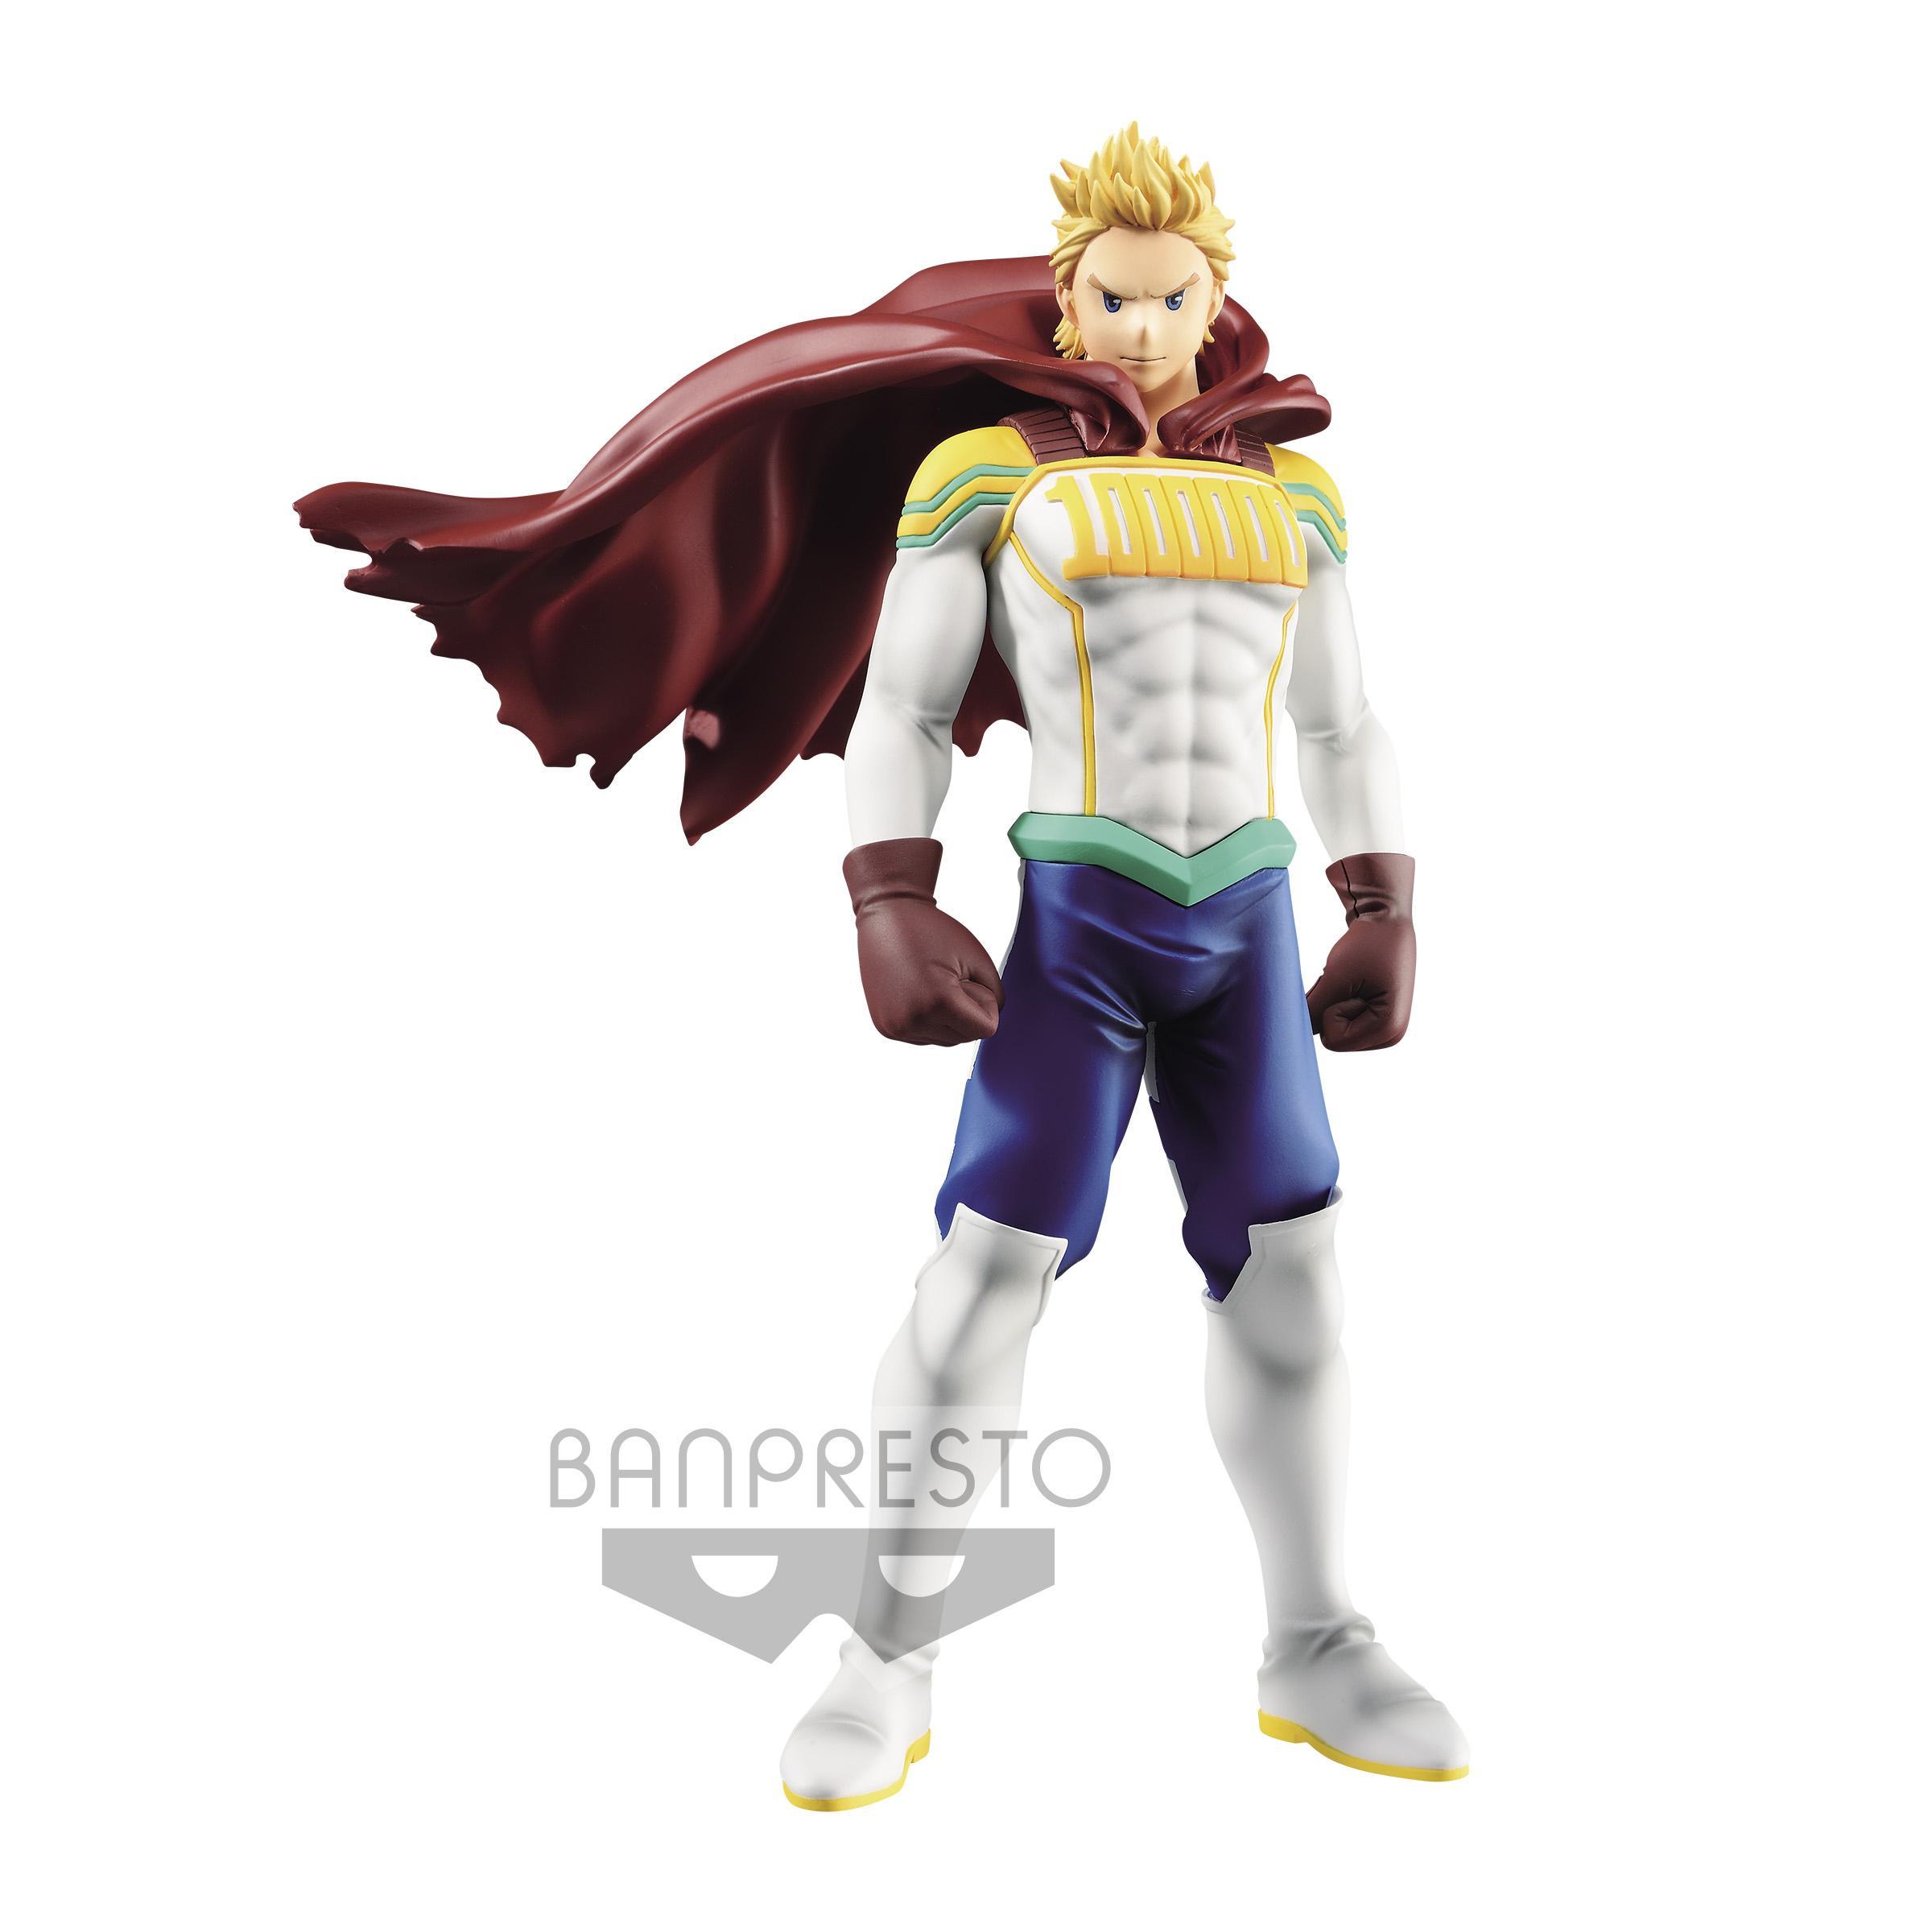 2020 Orjinal My Hero Academia Yaş Heroes AOH Mirio Toogata Milyon PVC Action Figure Koleksiyon Modeli Bebek Oyuncakları 1008